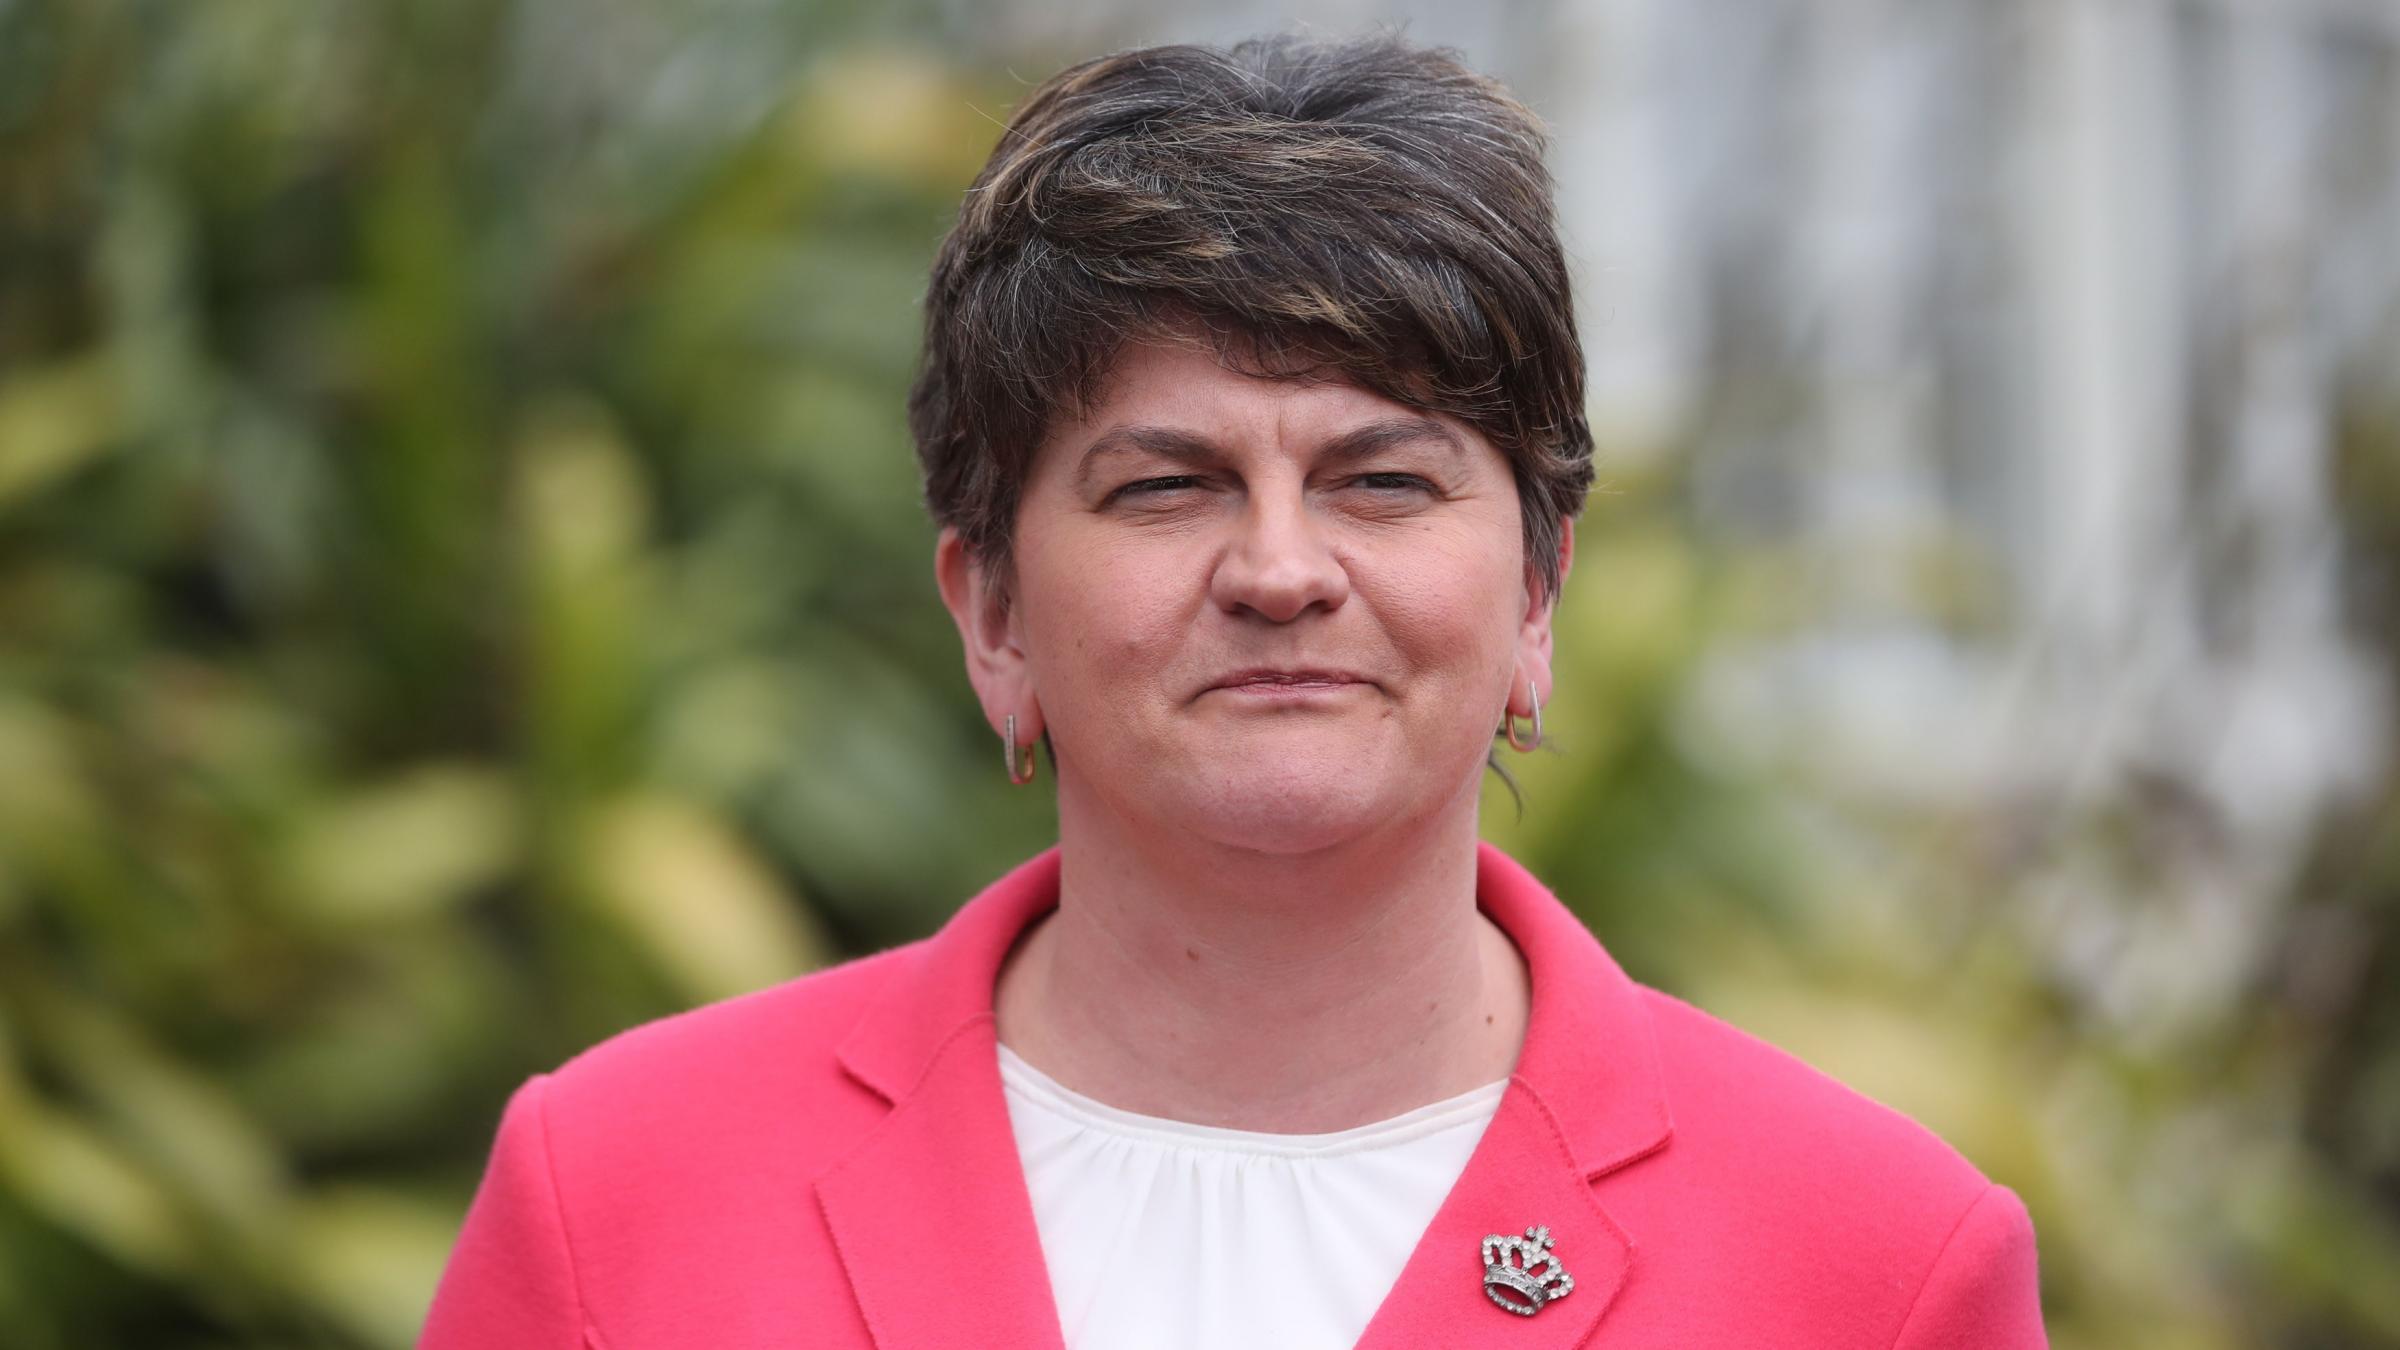 Theresa May Shuns Calls To Resign After Shock Result